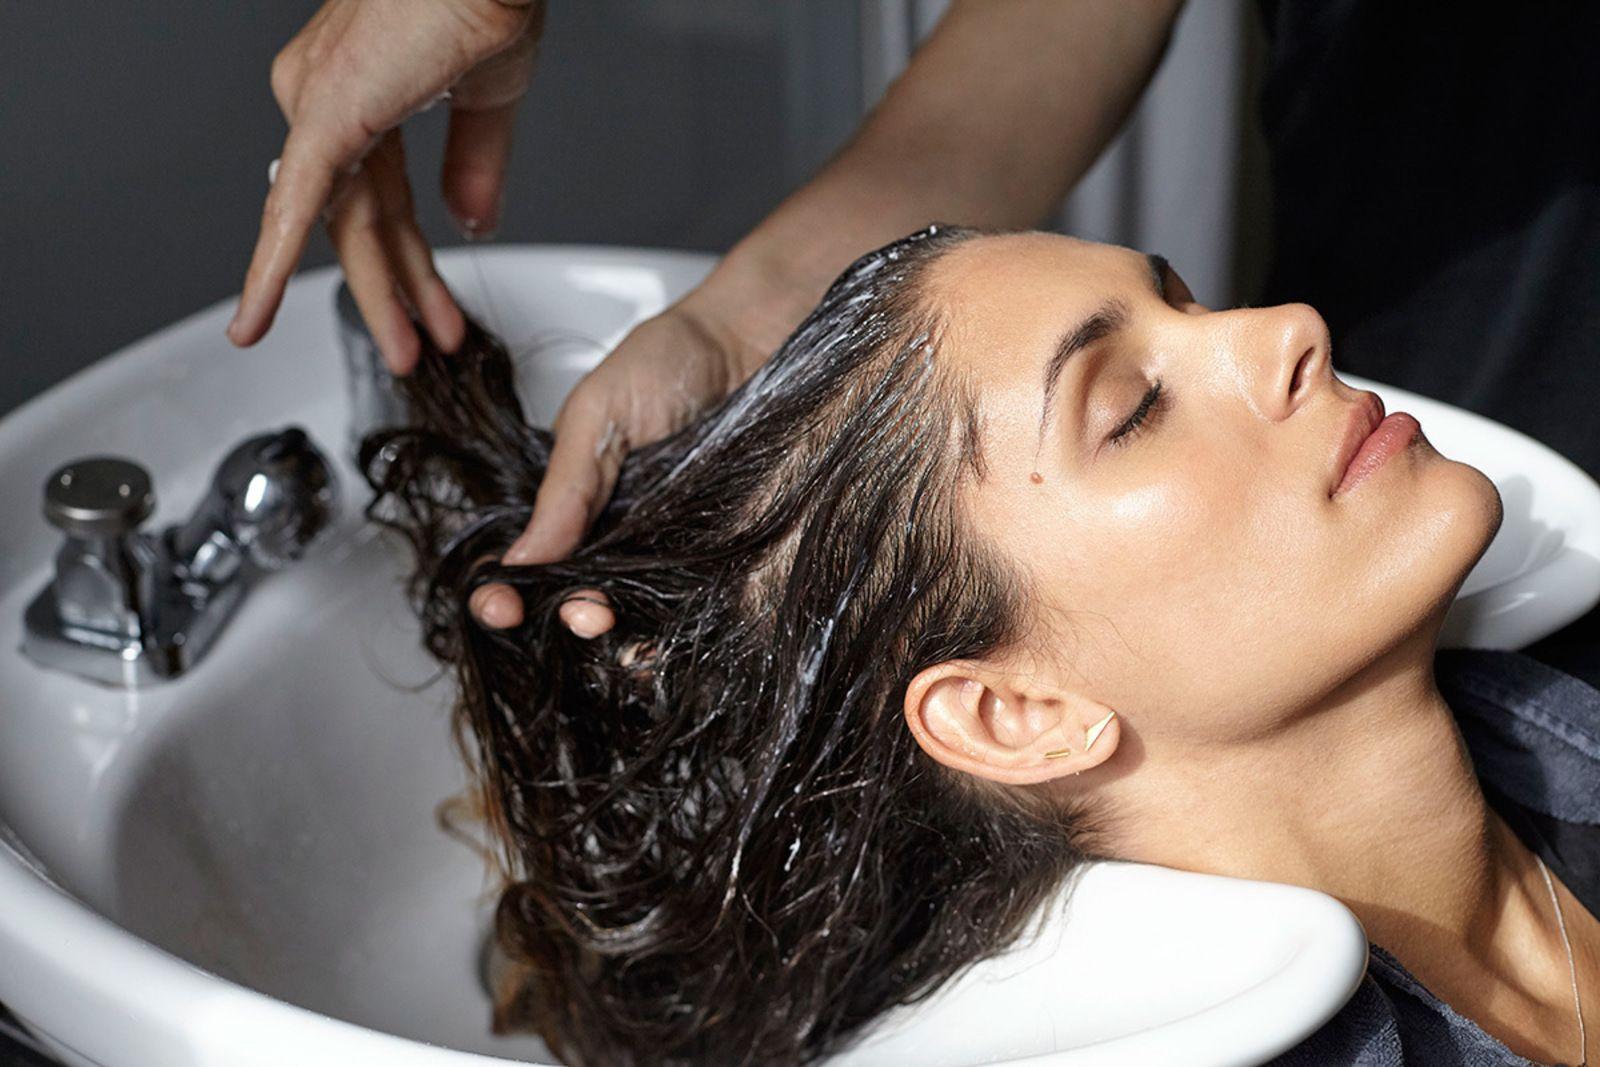 large-hairstory-new-way-to-wash-shampoo-1-0df13269eb8d67e9636996a1ed535851.jpg